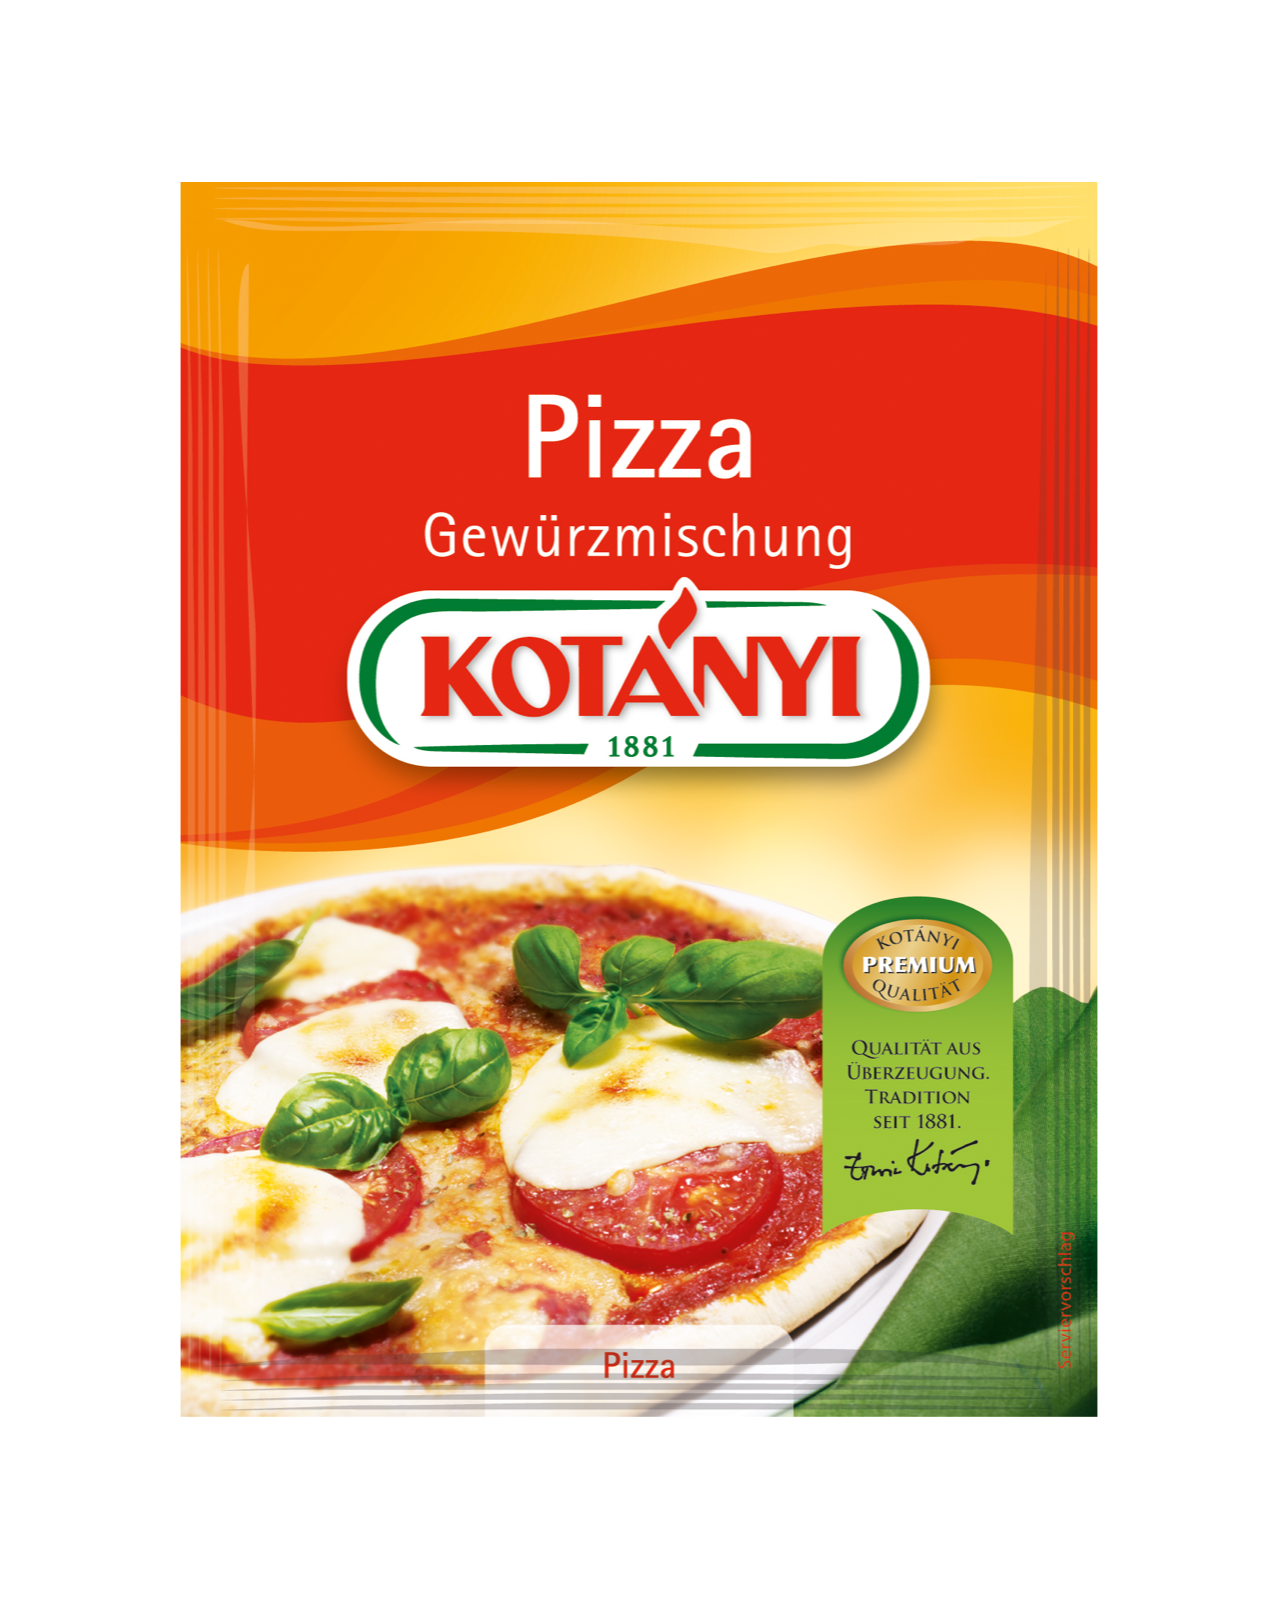 Kotányi Pizza Gewürzmischung im Brief